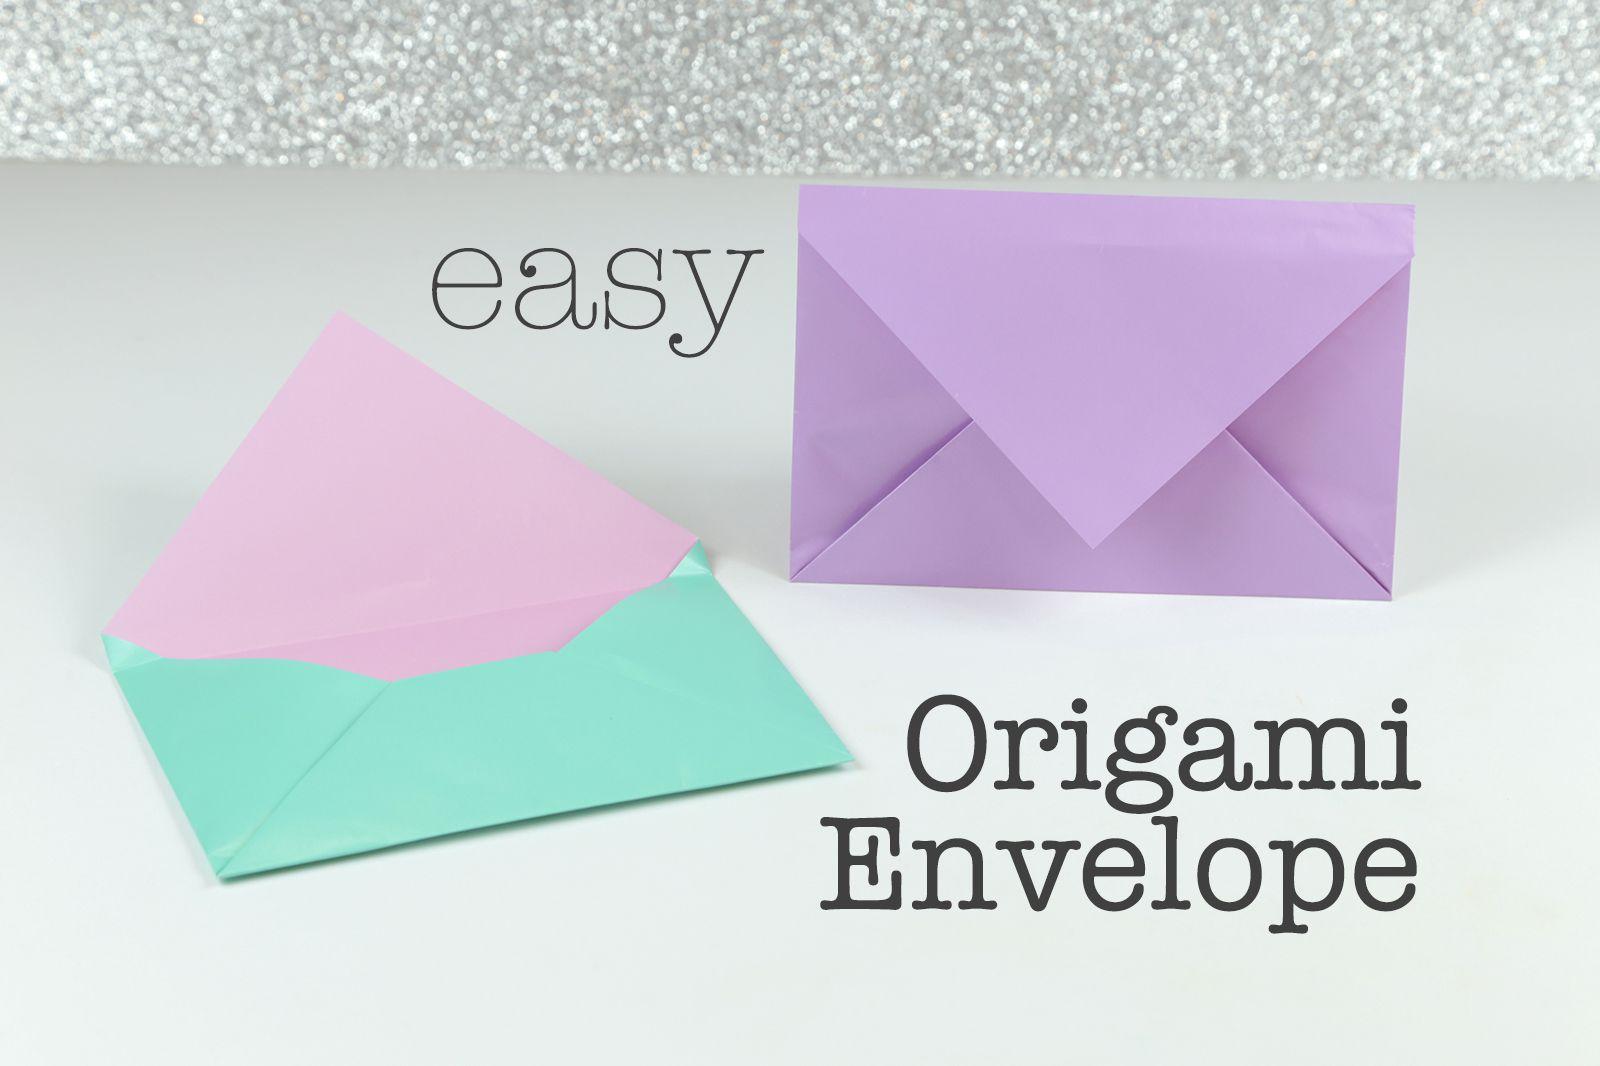 Envelope Origami Easy How To Make An Easy Origami Envelope